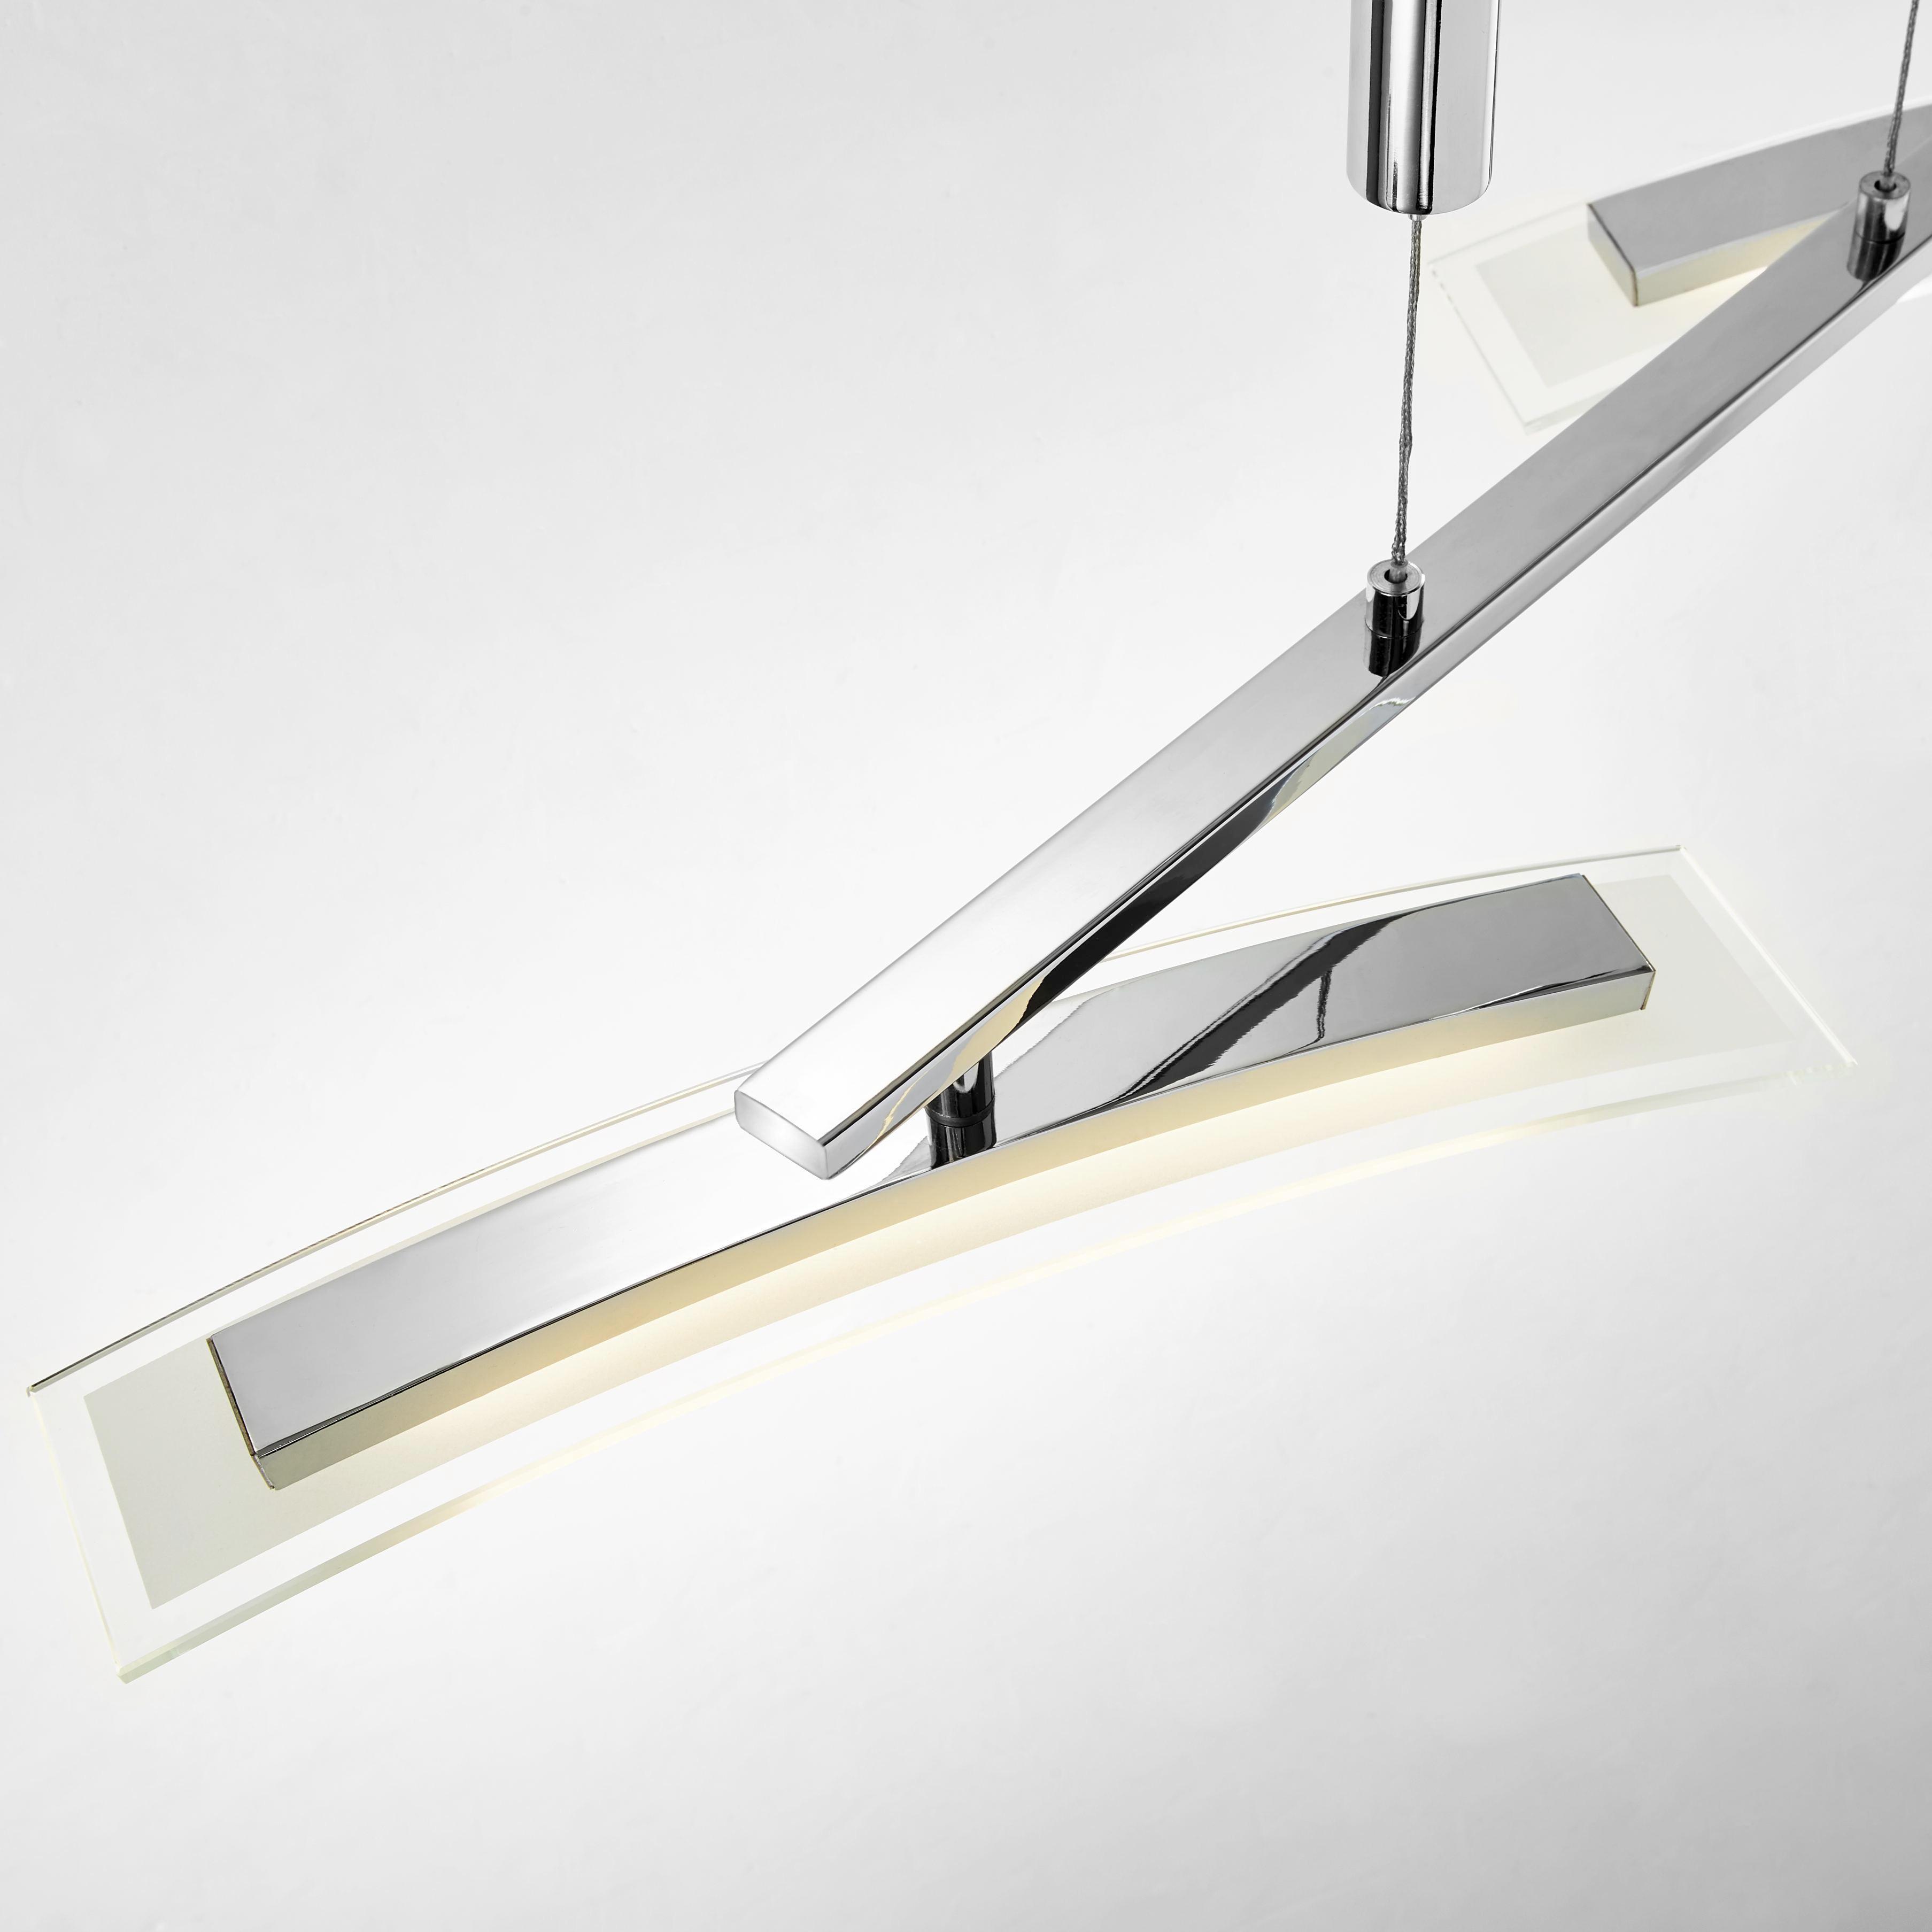 LED-HÄNGELEUCHTE - Chromfarben, KONVENTIONELL, Glas/Metall (90/8/170cm) - NOVEL